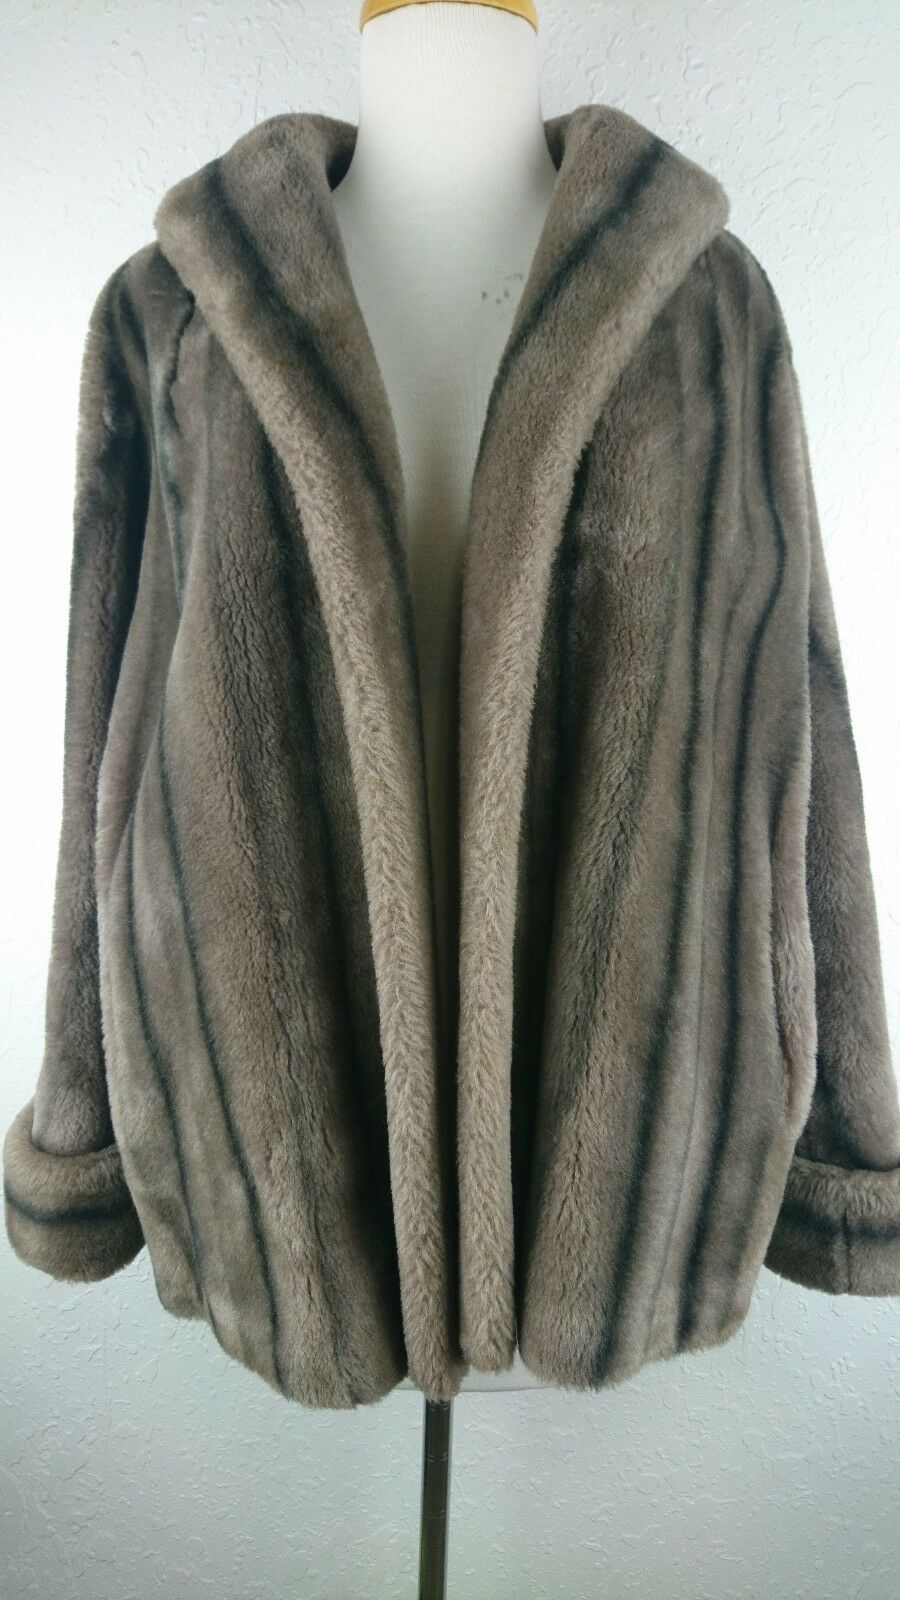 Vintage Princeton's Mutation S   M Natural Brown Faux Fur Mink Coat 3 4 Sleeve G